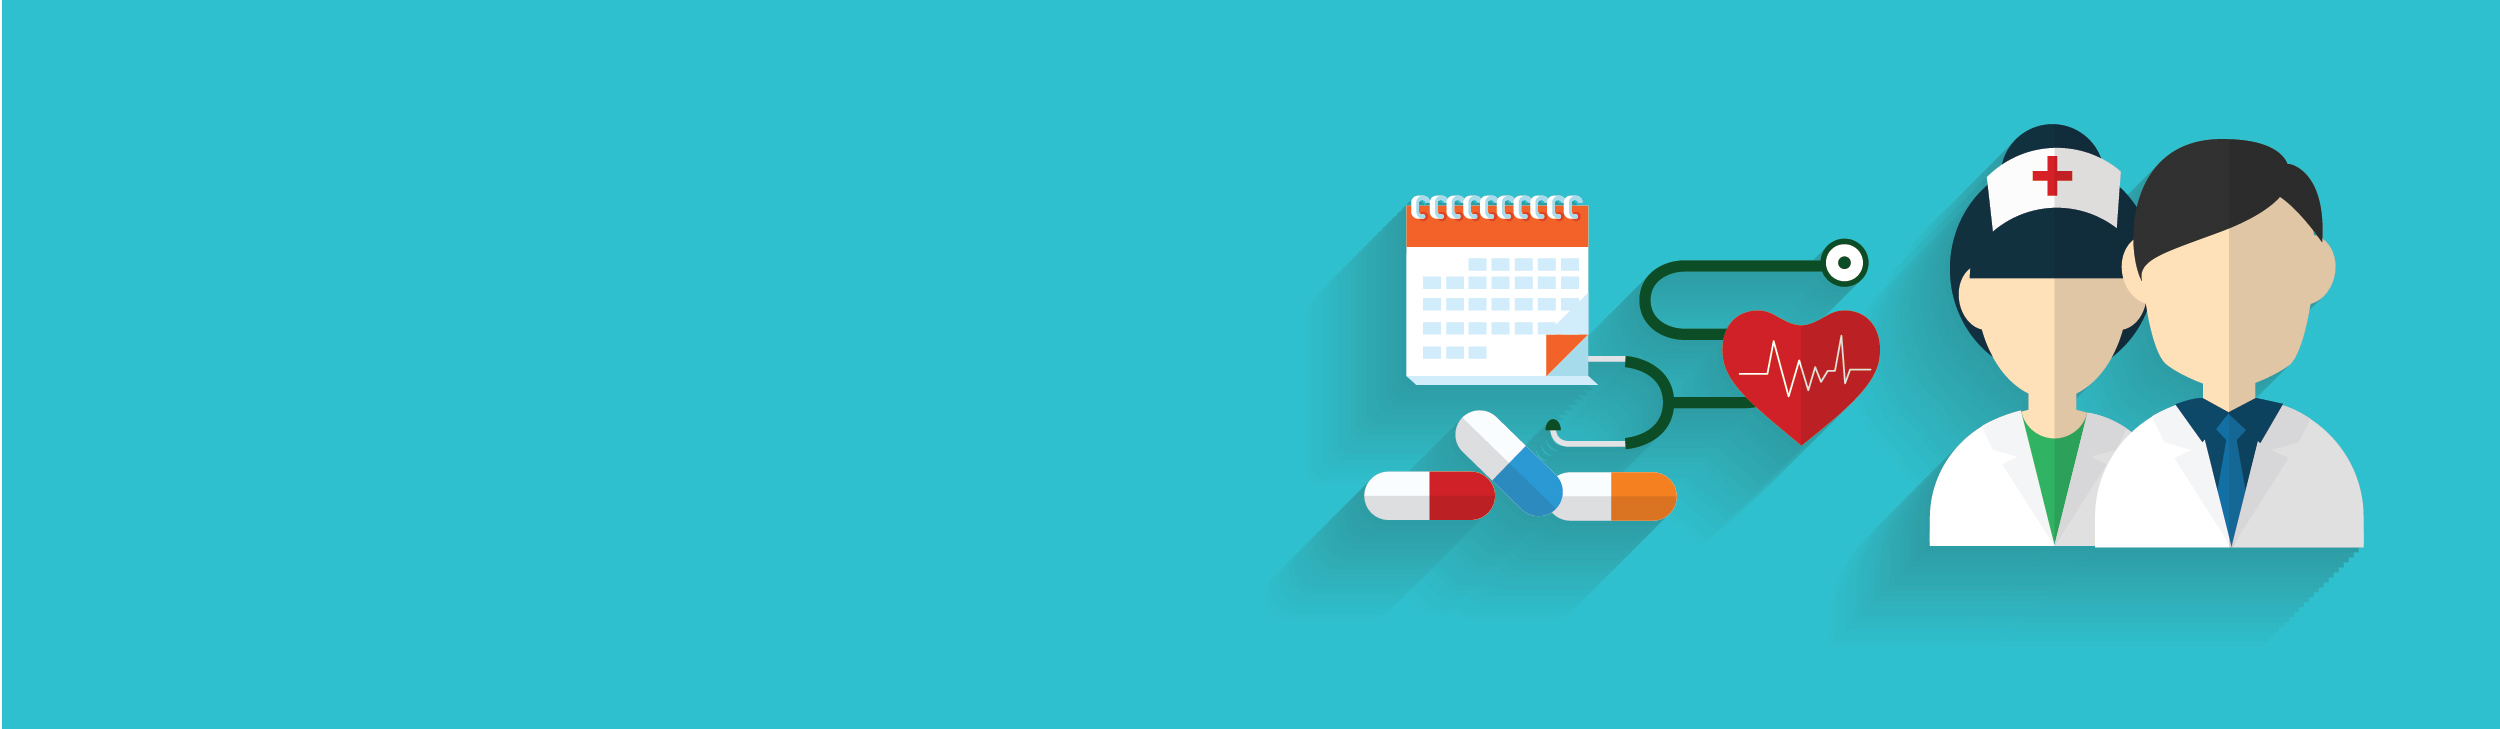 8KMiles_web-banner__Healthcare-IT-service